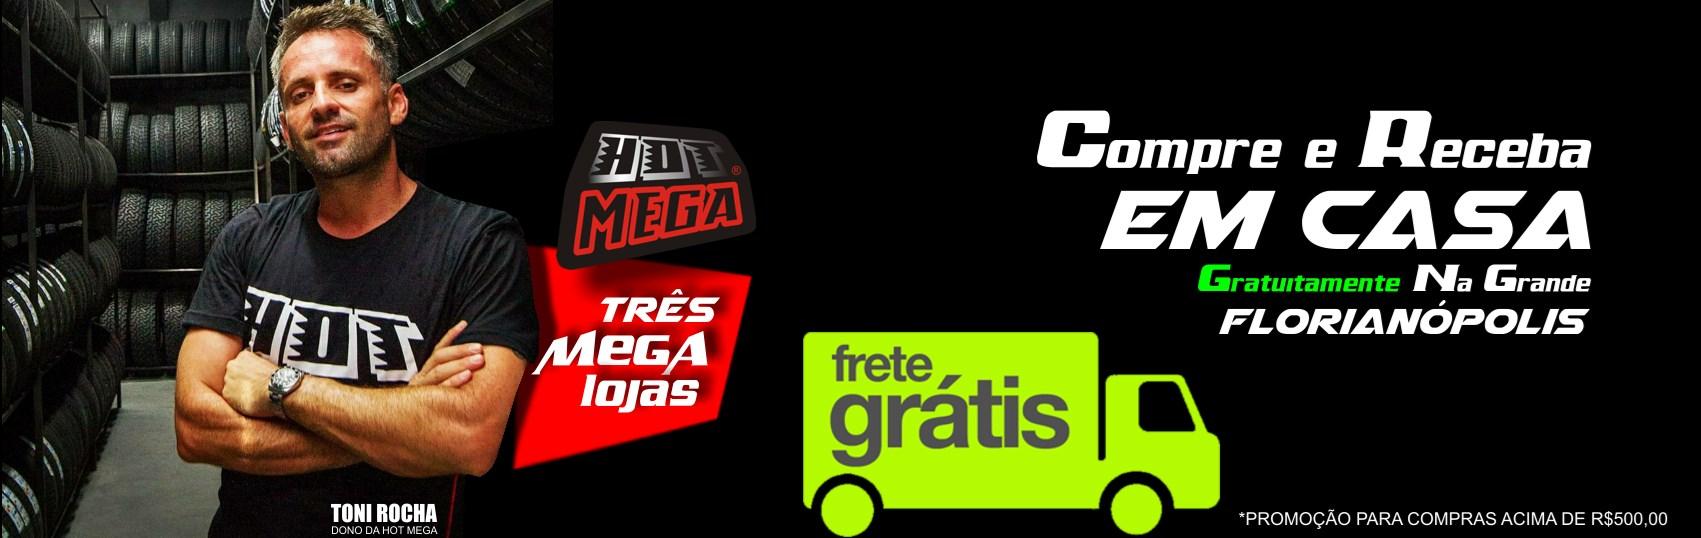 Black Friday na Hot Mega- FRETE GRÁTIS + 23% off + 5%off